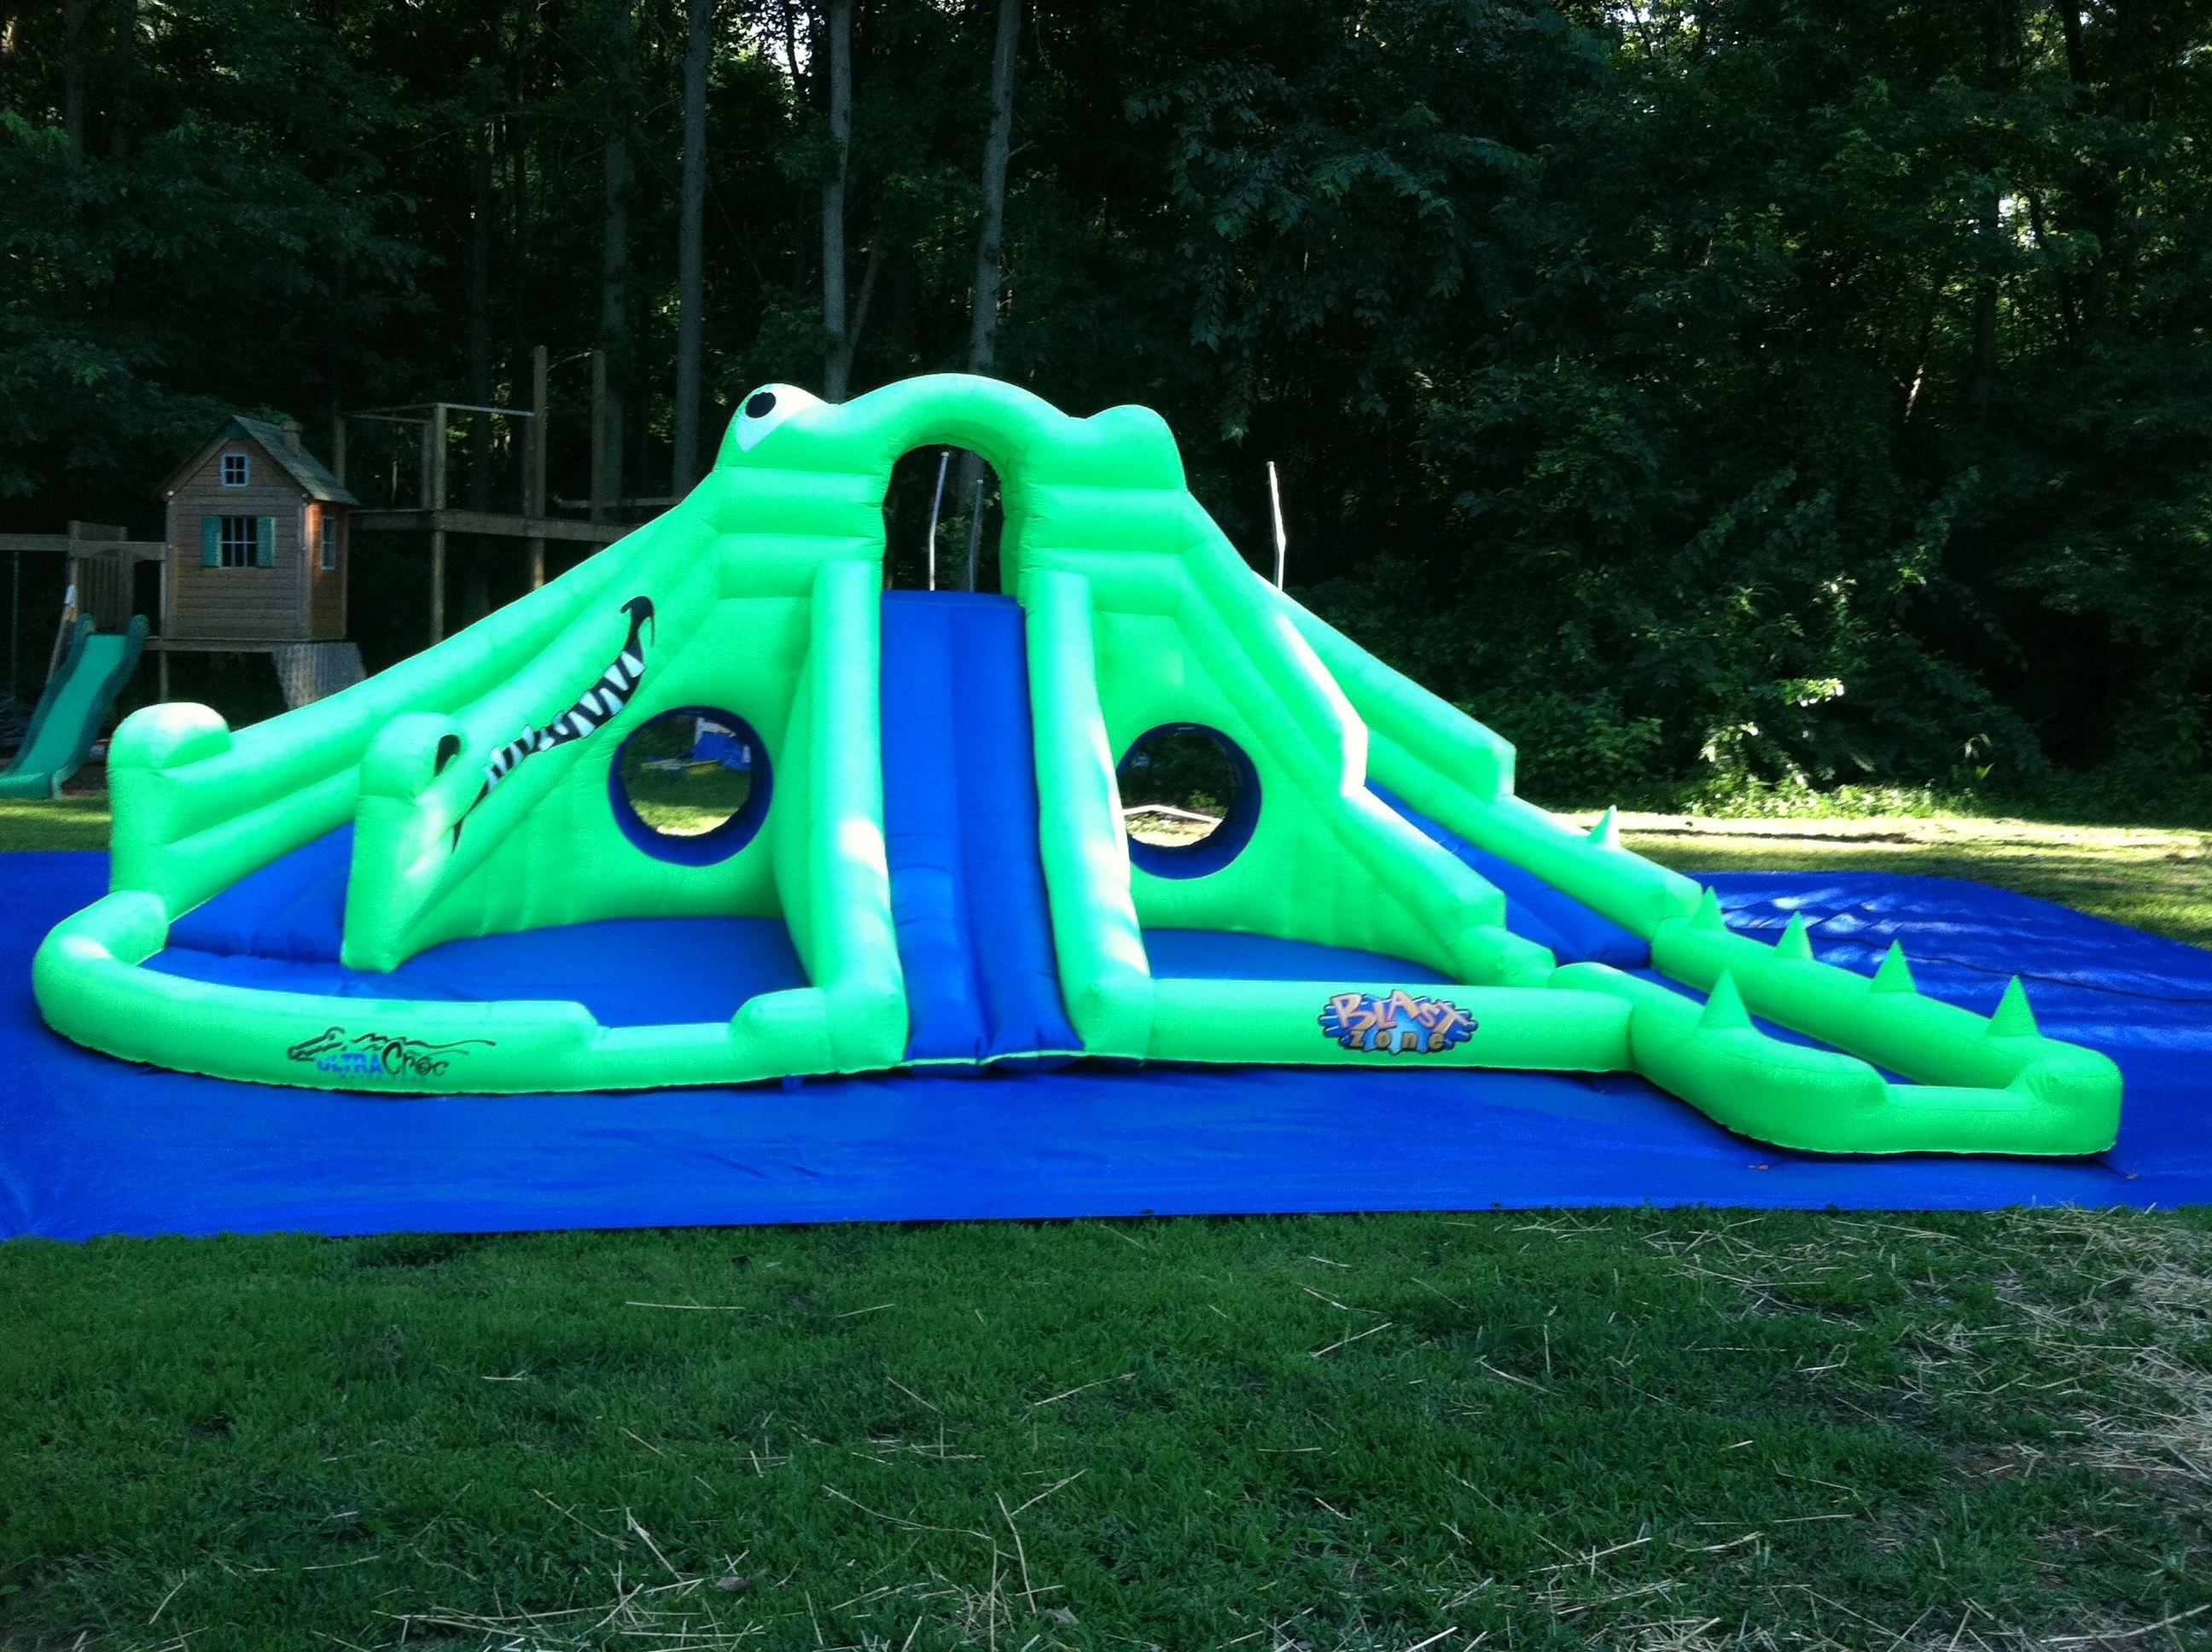 ultra croc water slide 21x21x8 5 rental fee 250 southern illinois